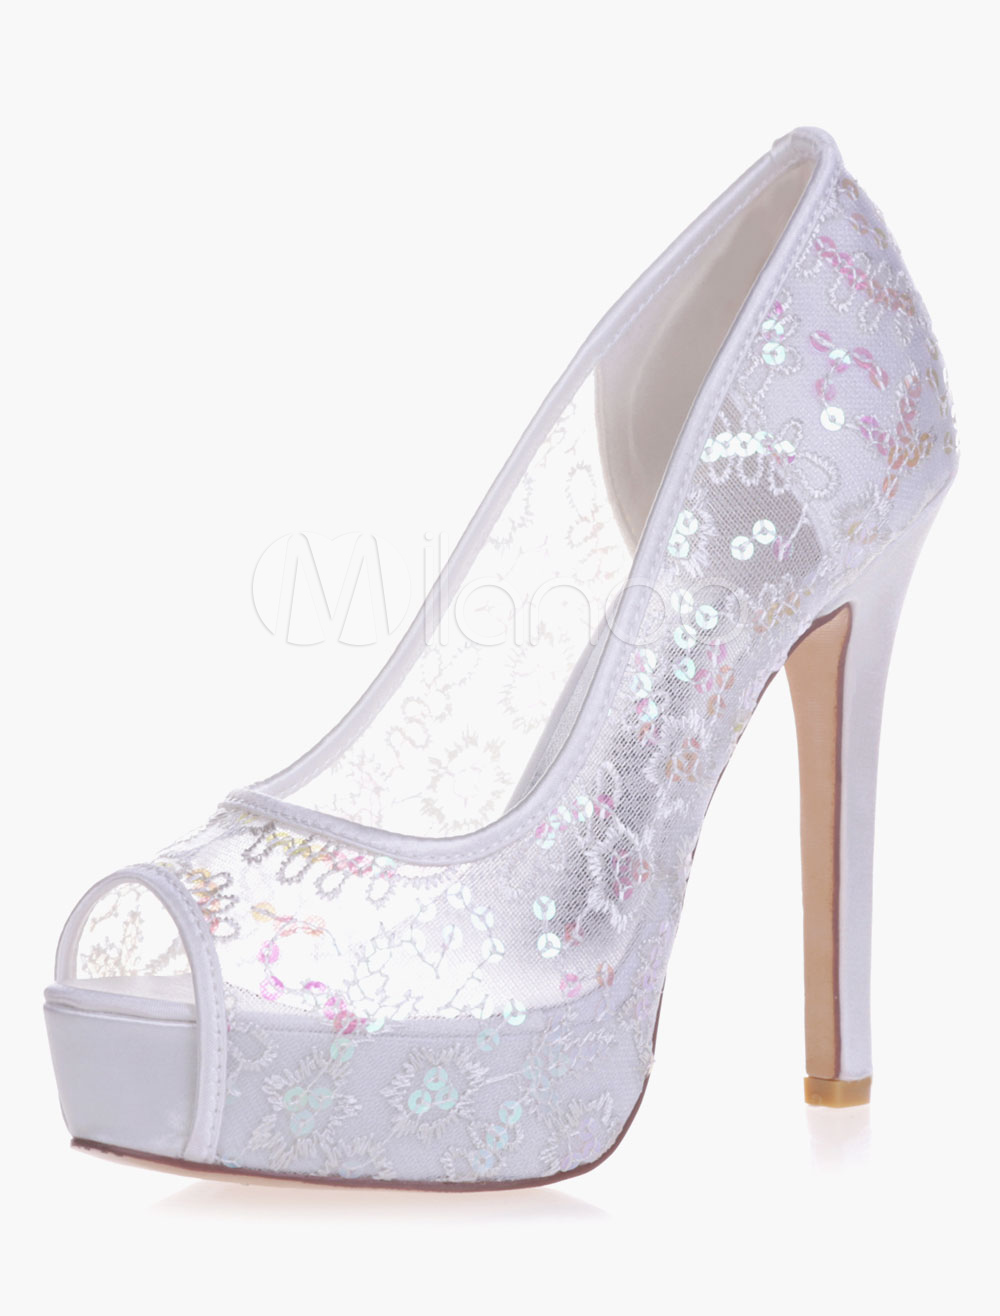 Sequins Platrorm Slip-On Peep Toe Lace Elegant Evening And Bride's Sandals